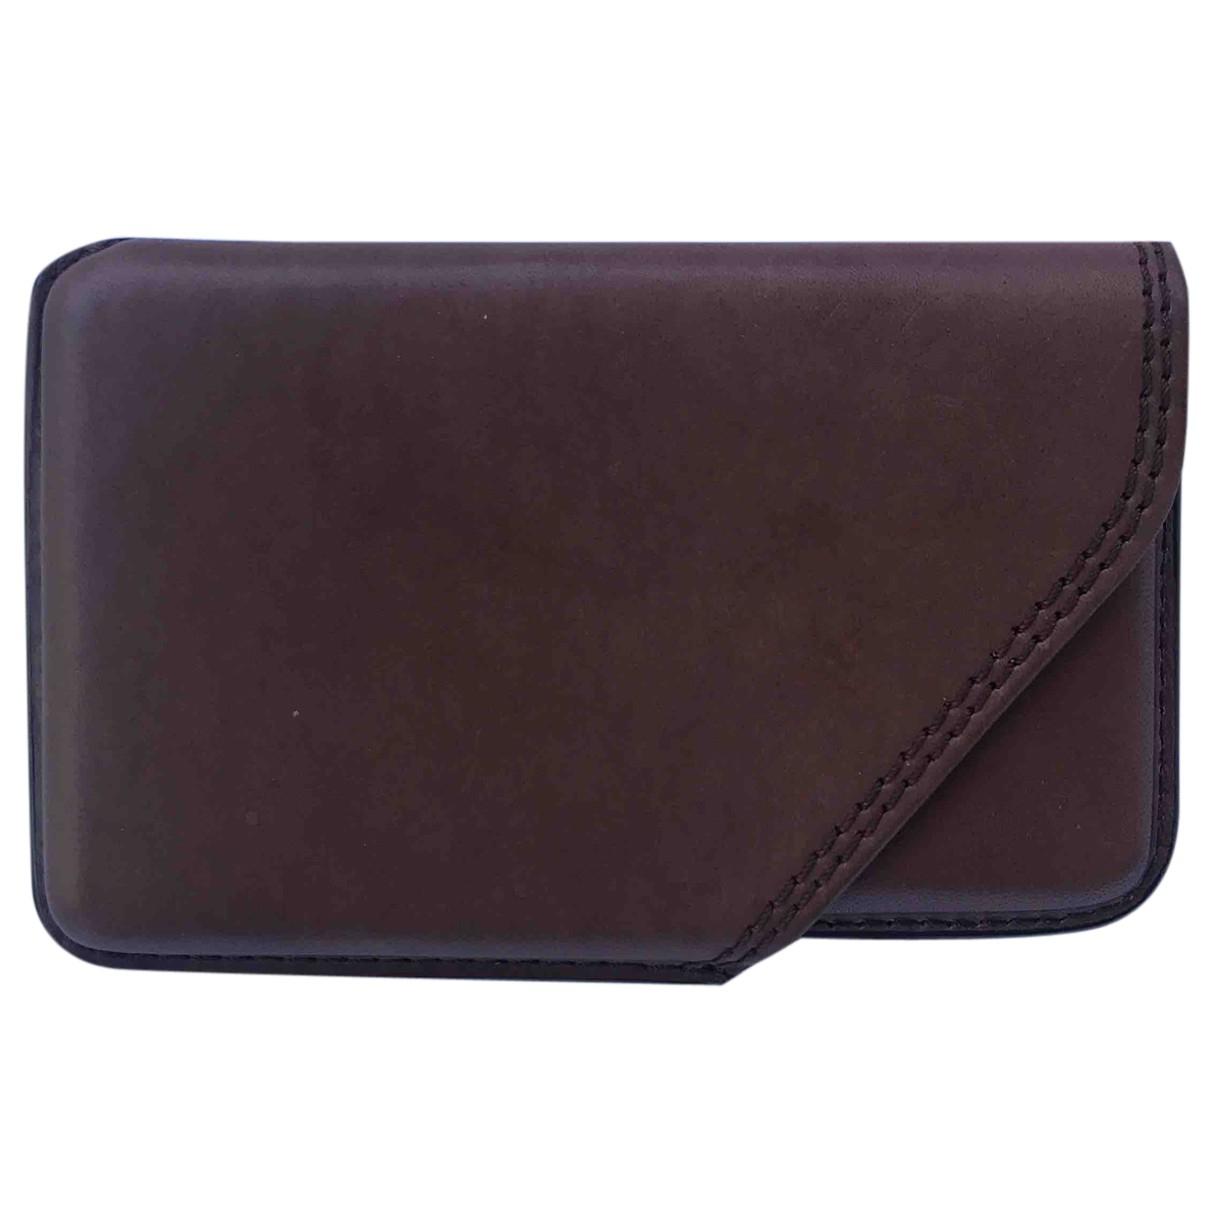 Parmigiani Fleurier N Brown Leather Purses, wallet & cases for Women N